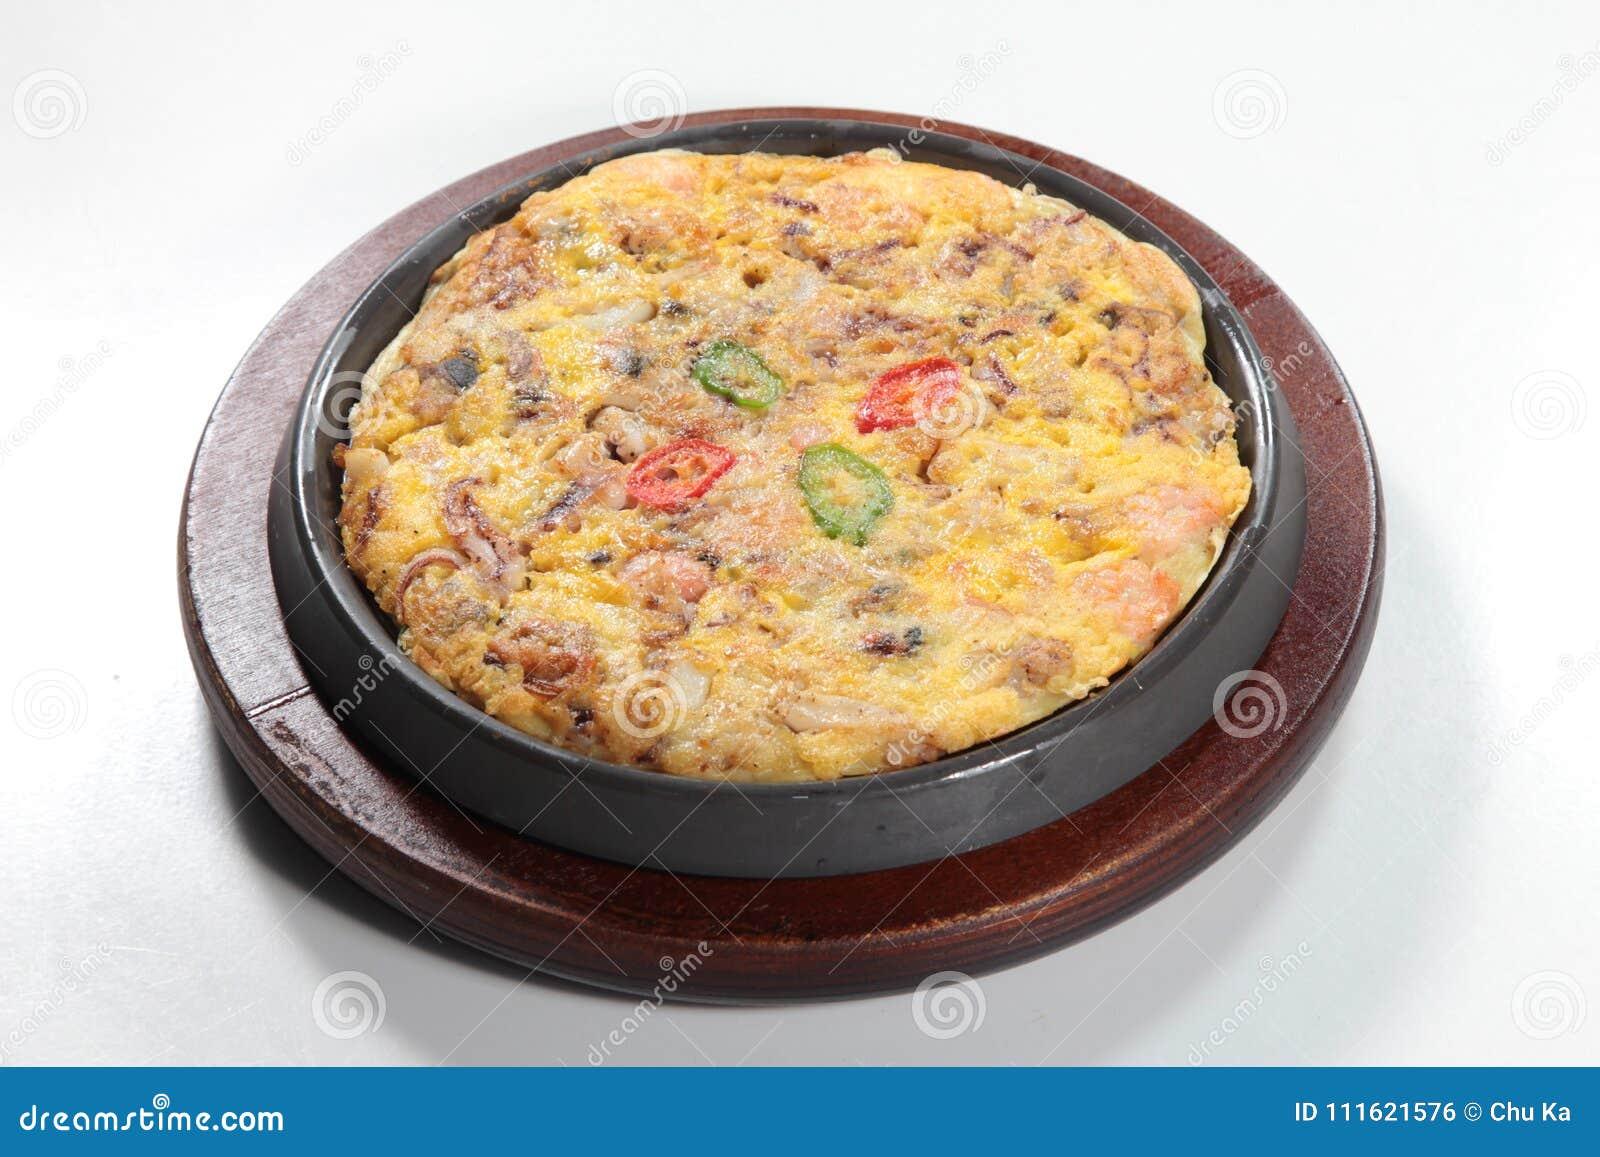 Fresh and tasty scrambled egg or omelette